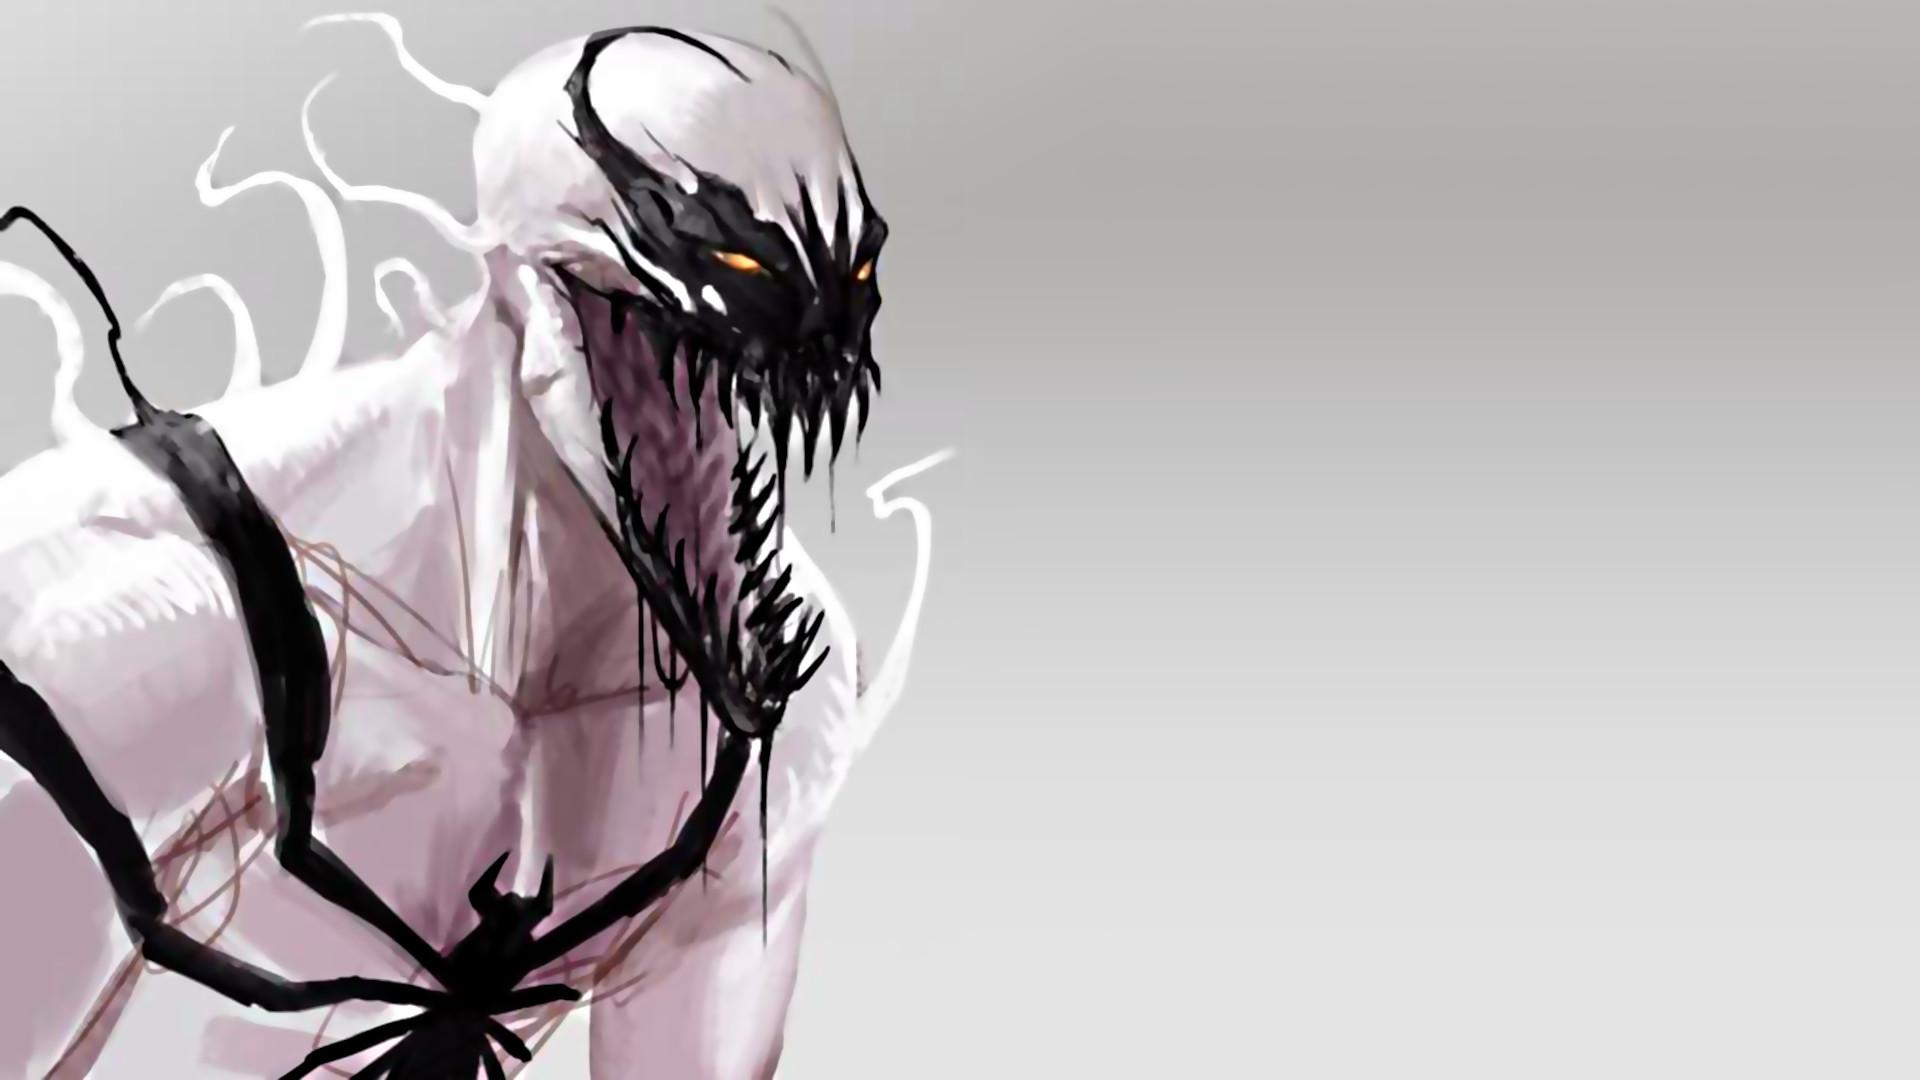 Anti Venom Wallpaper Iphone